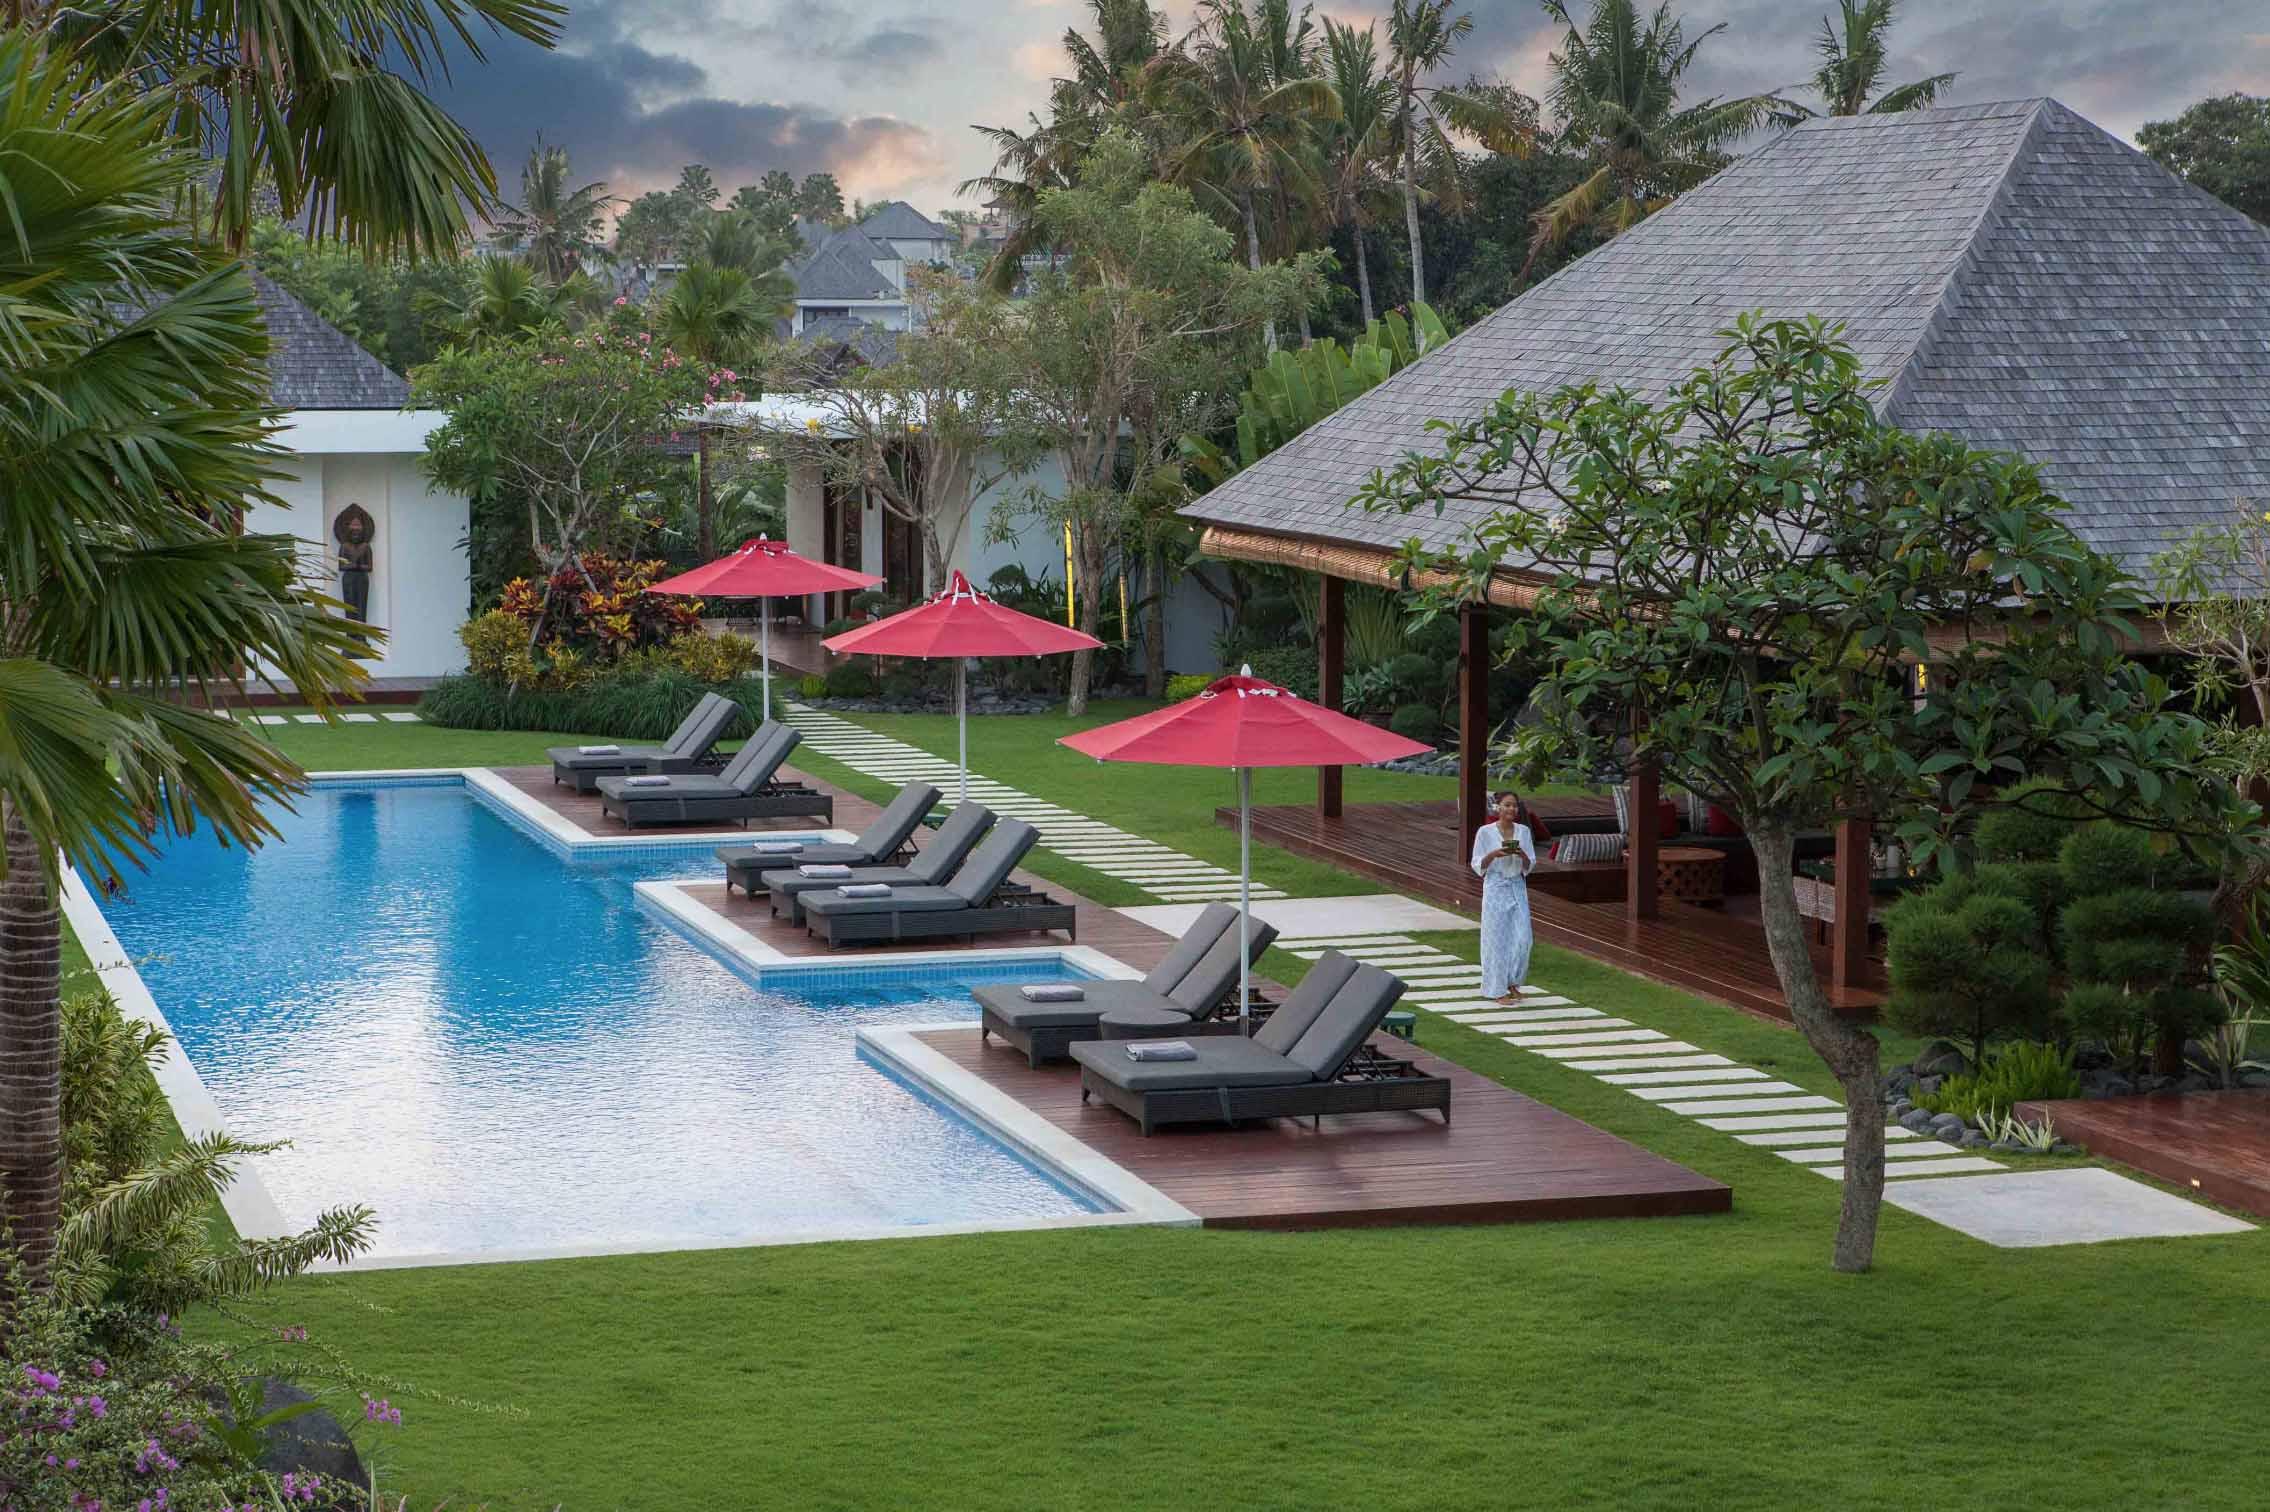 Villa Malaathina Bali - Early Morning - Umalas, Bali